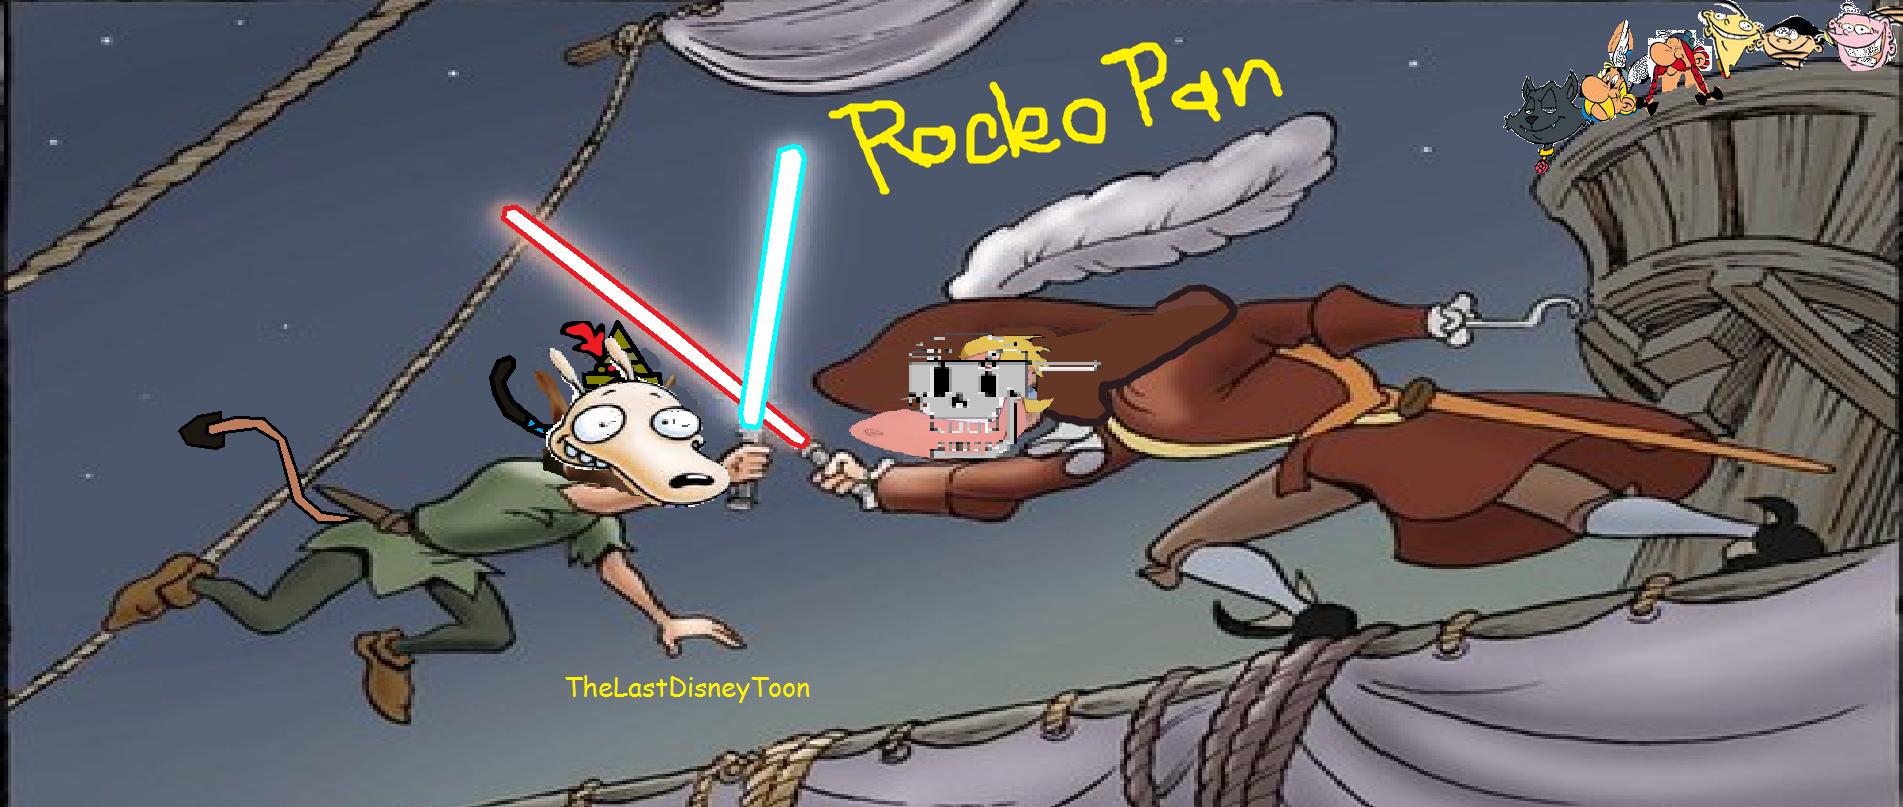 Rocko Pan (TheLastDisneyToon and Toonmbia Style)